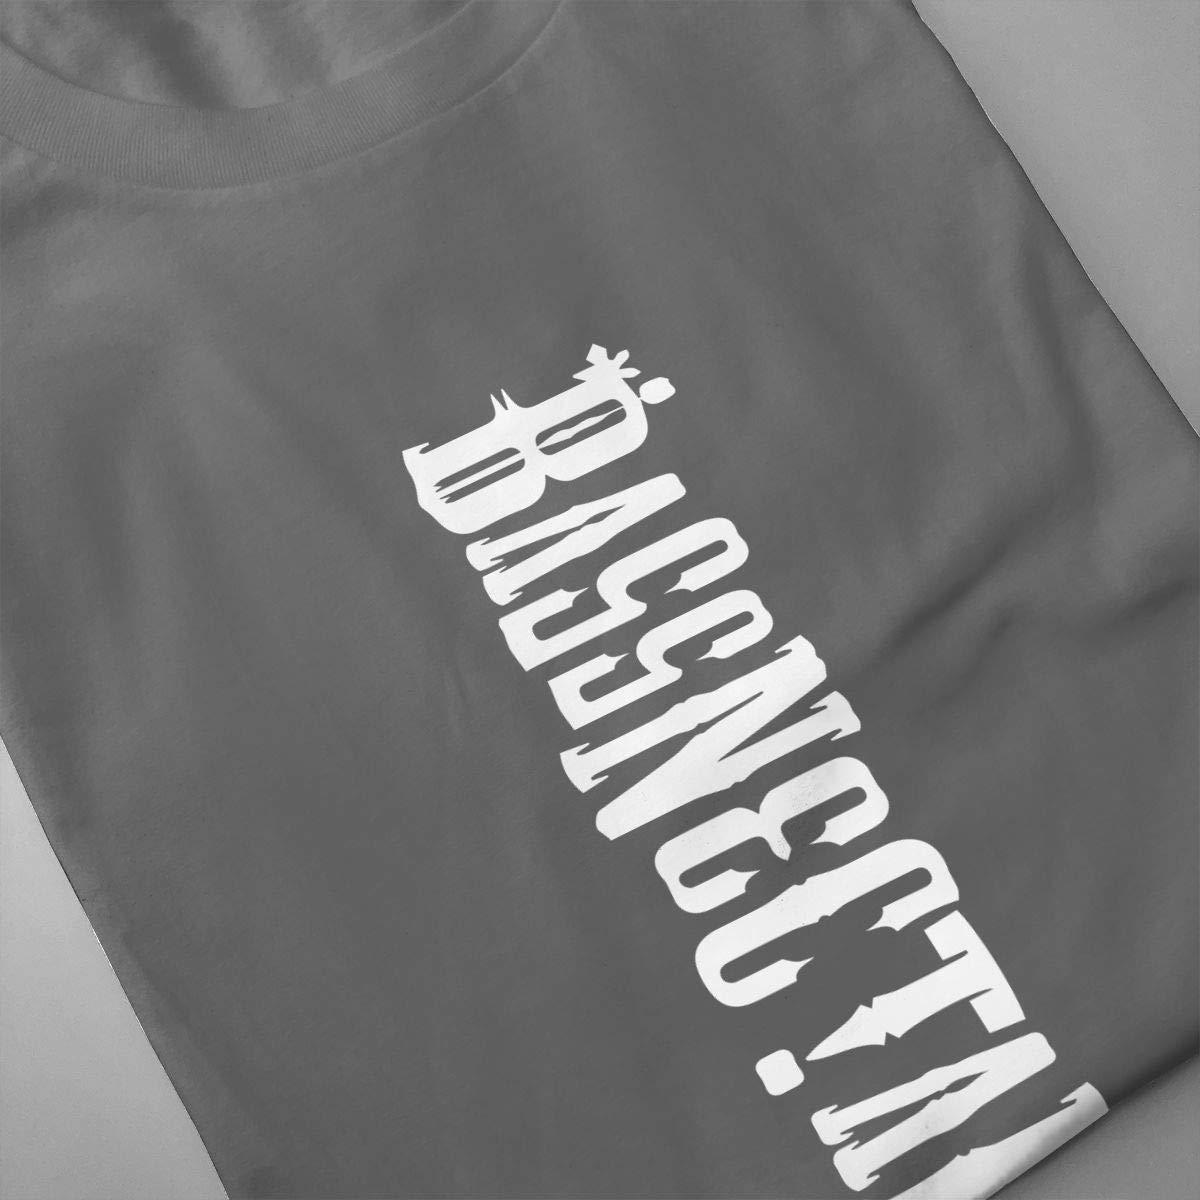 NEVER SKY Bassnectar 2 Adult Mens Essentials T-Shirt Cotton Crewneck